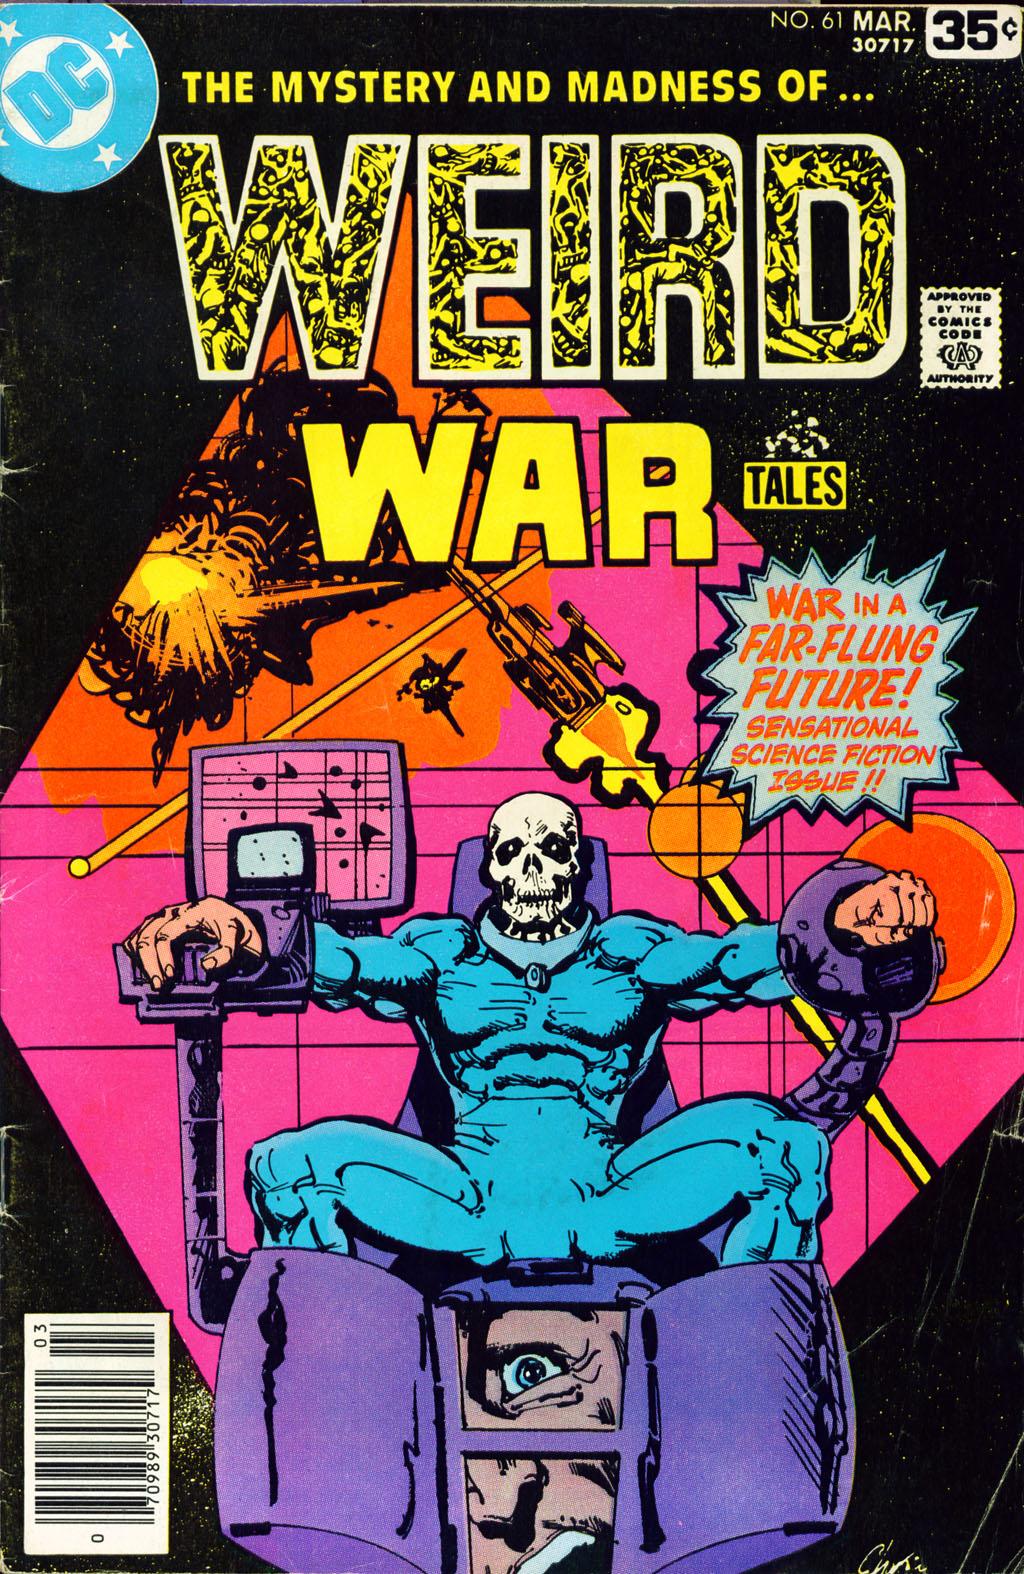 Weird War Tales (1971) issue 61 - Page 1